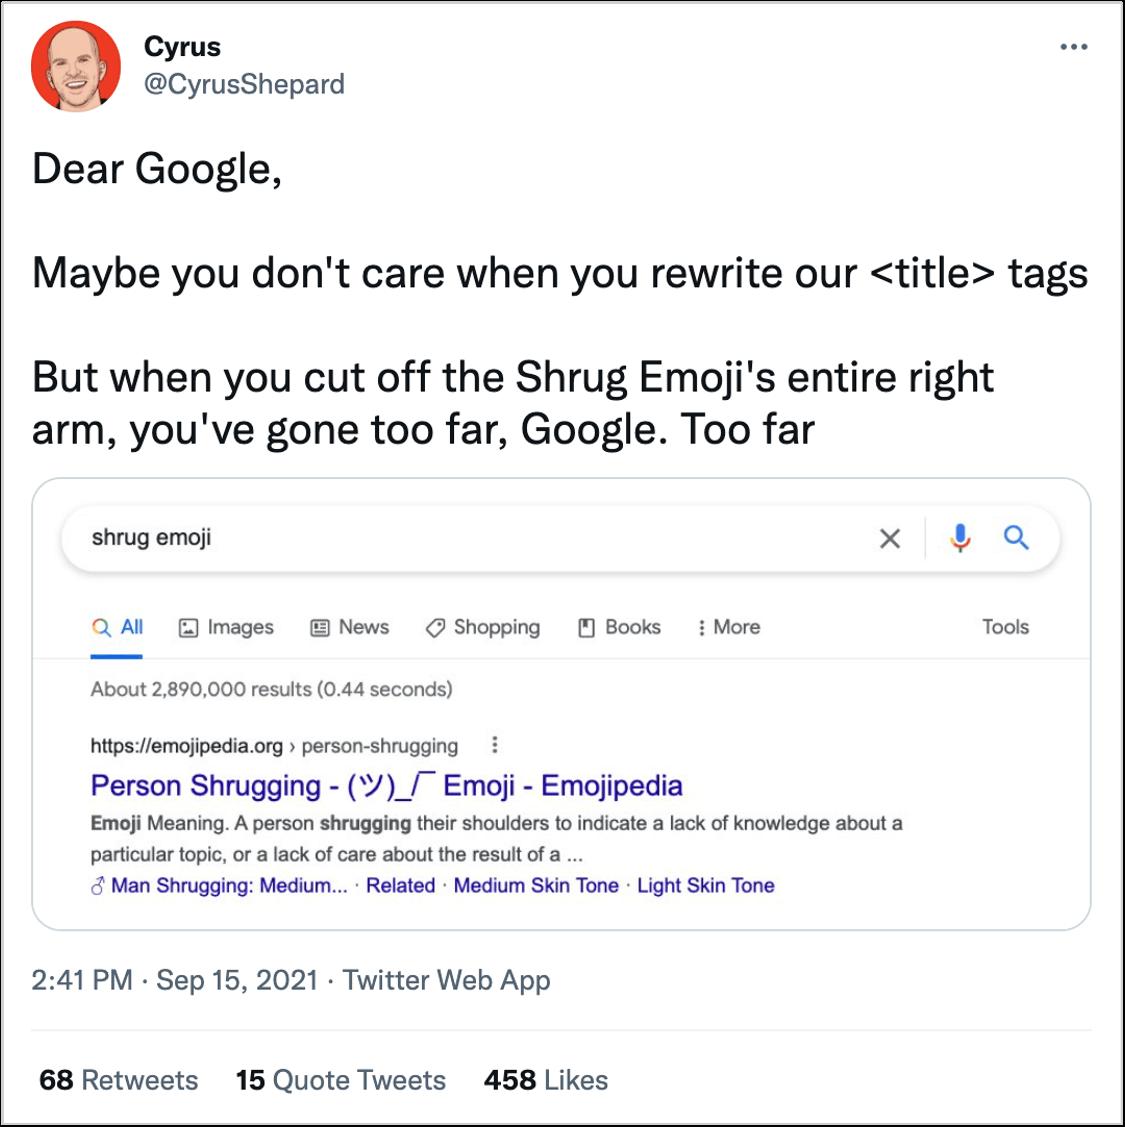 tweet showing title tag change for shrug emoji